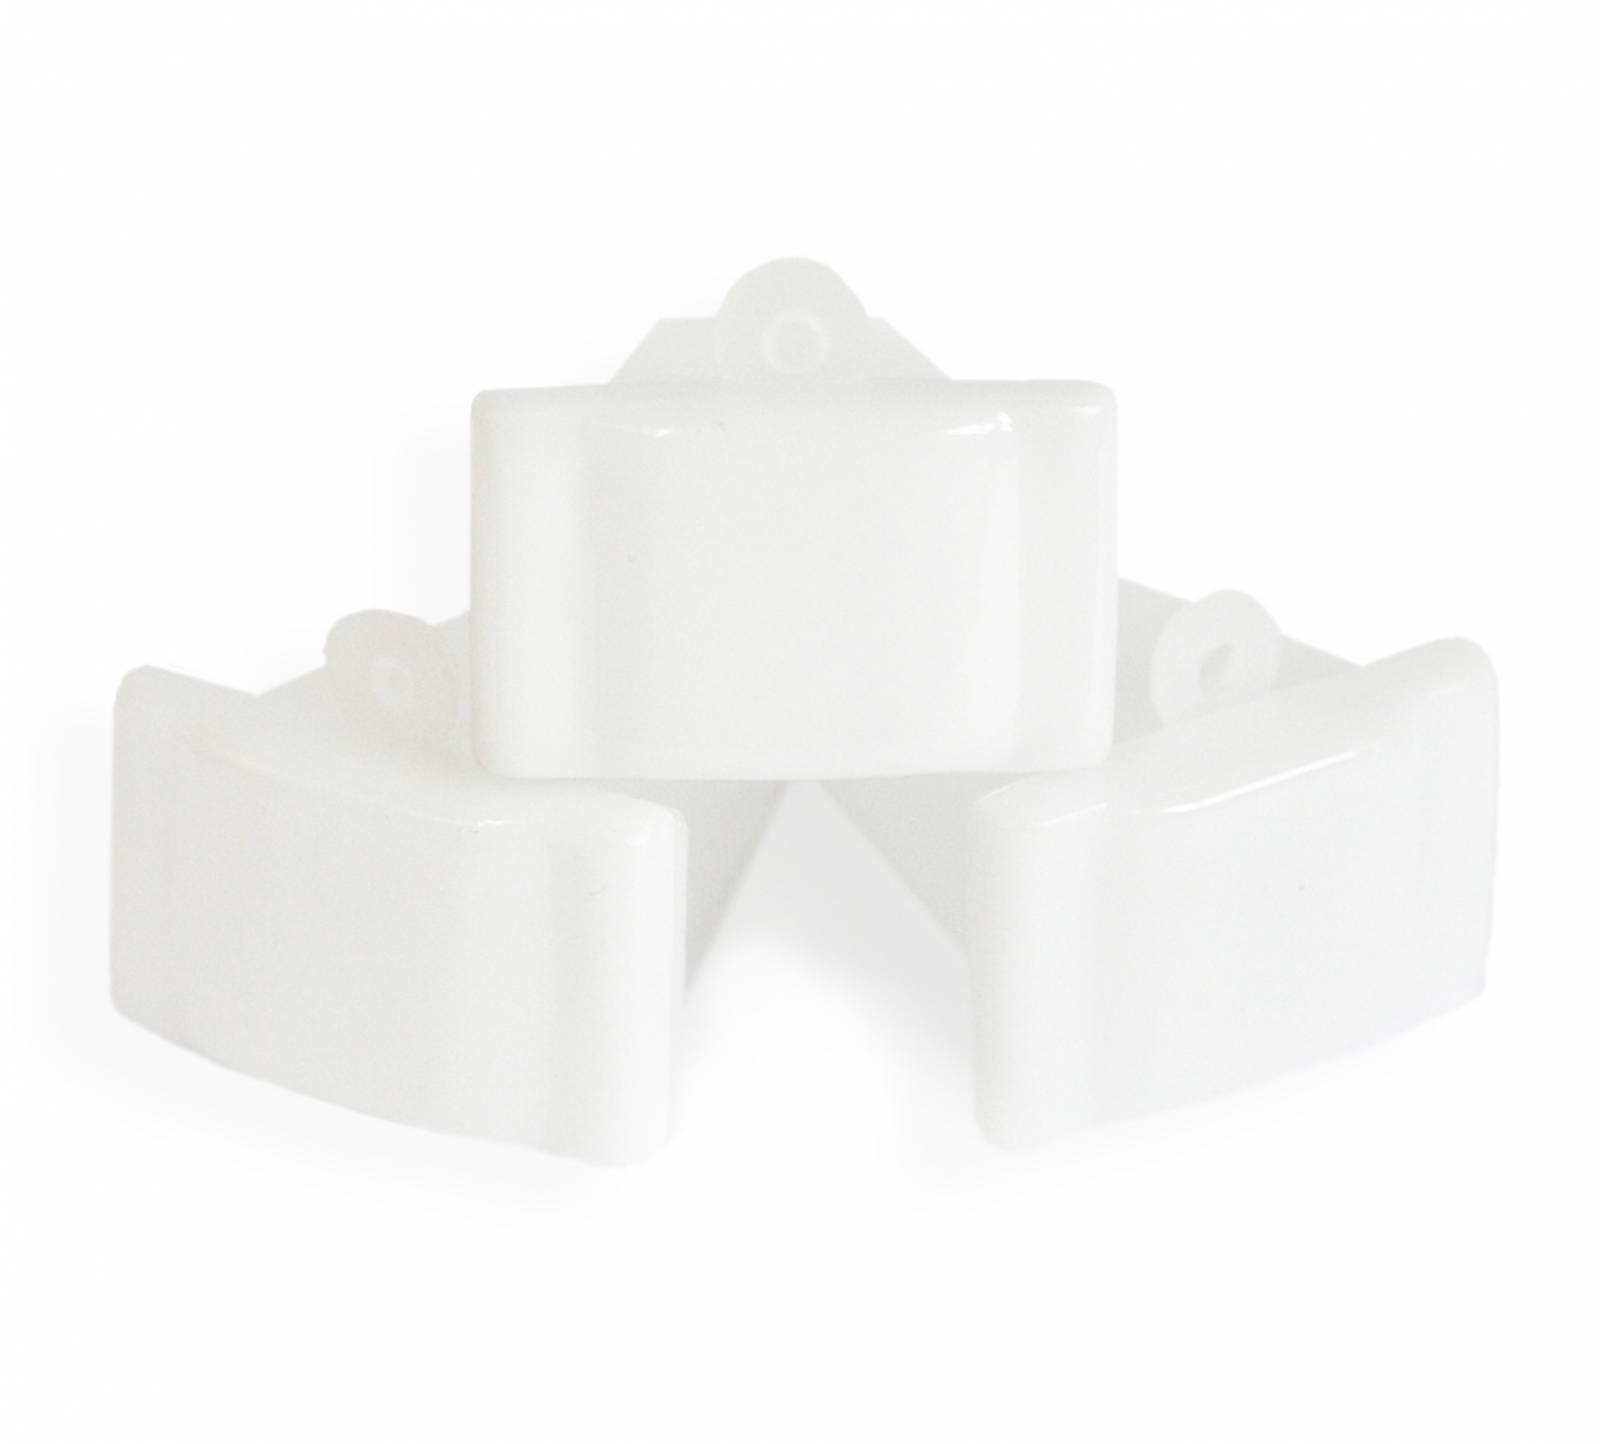 Monóculo Branco | kit c/10 unidades